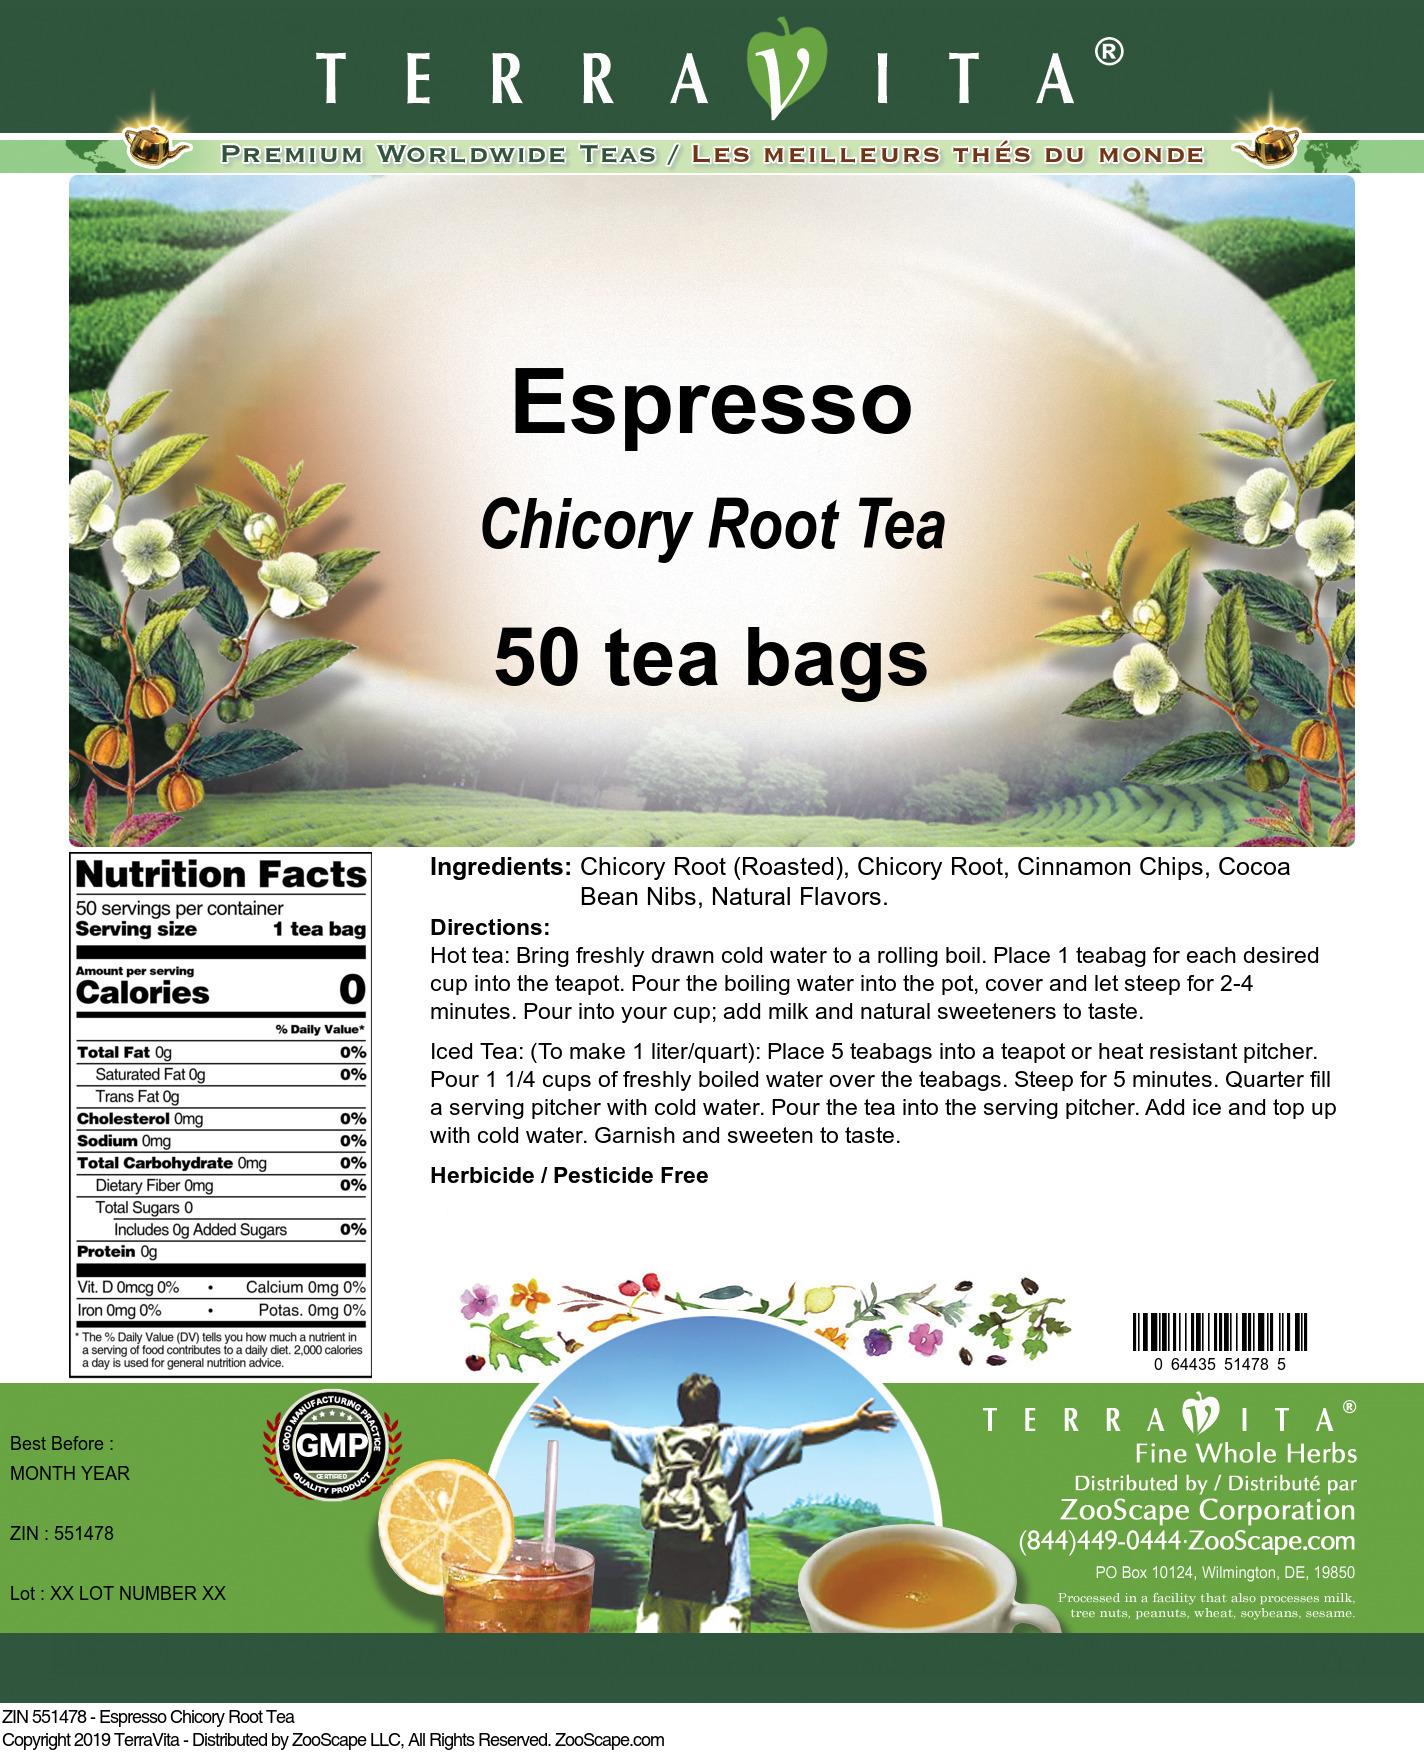 Espresso Chicory Root Tea